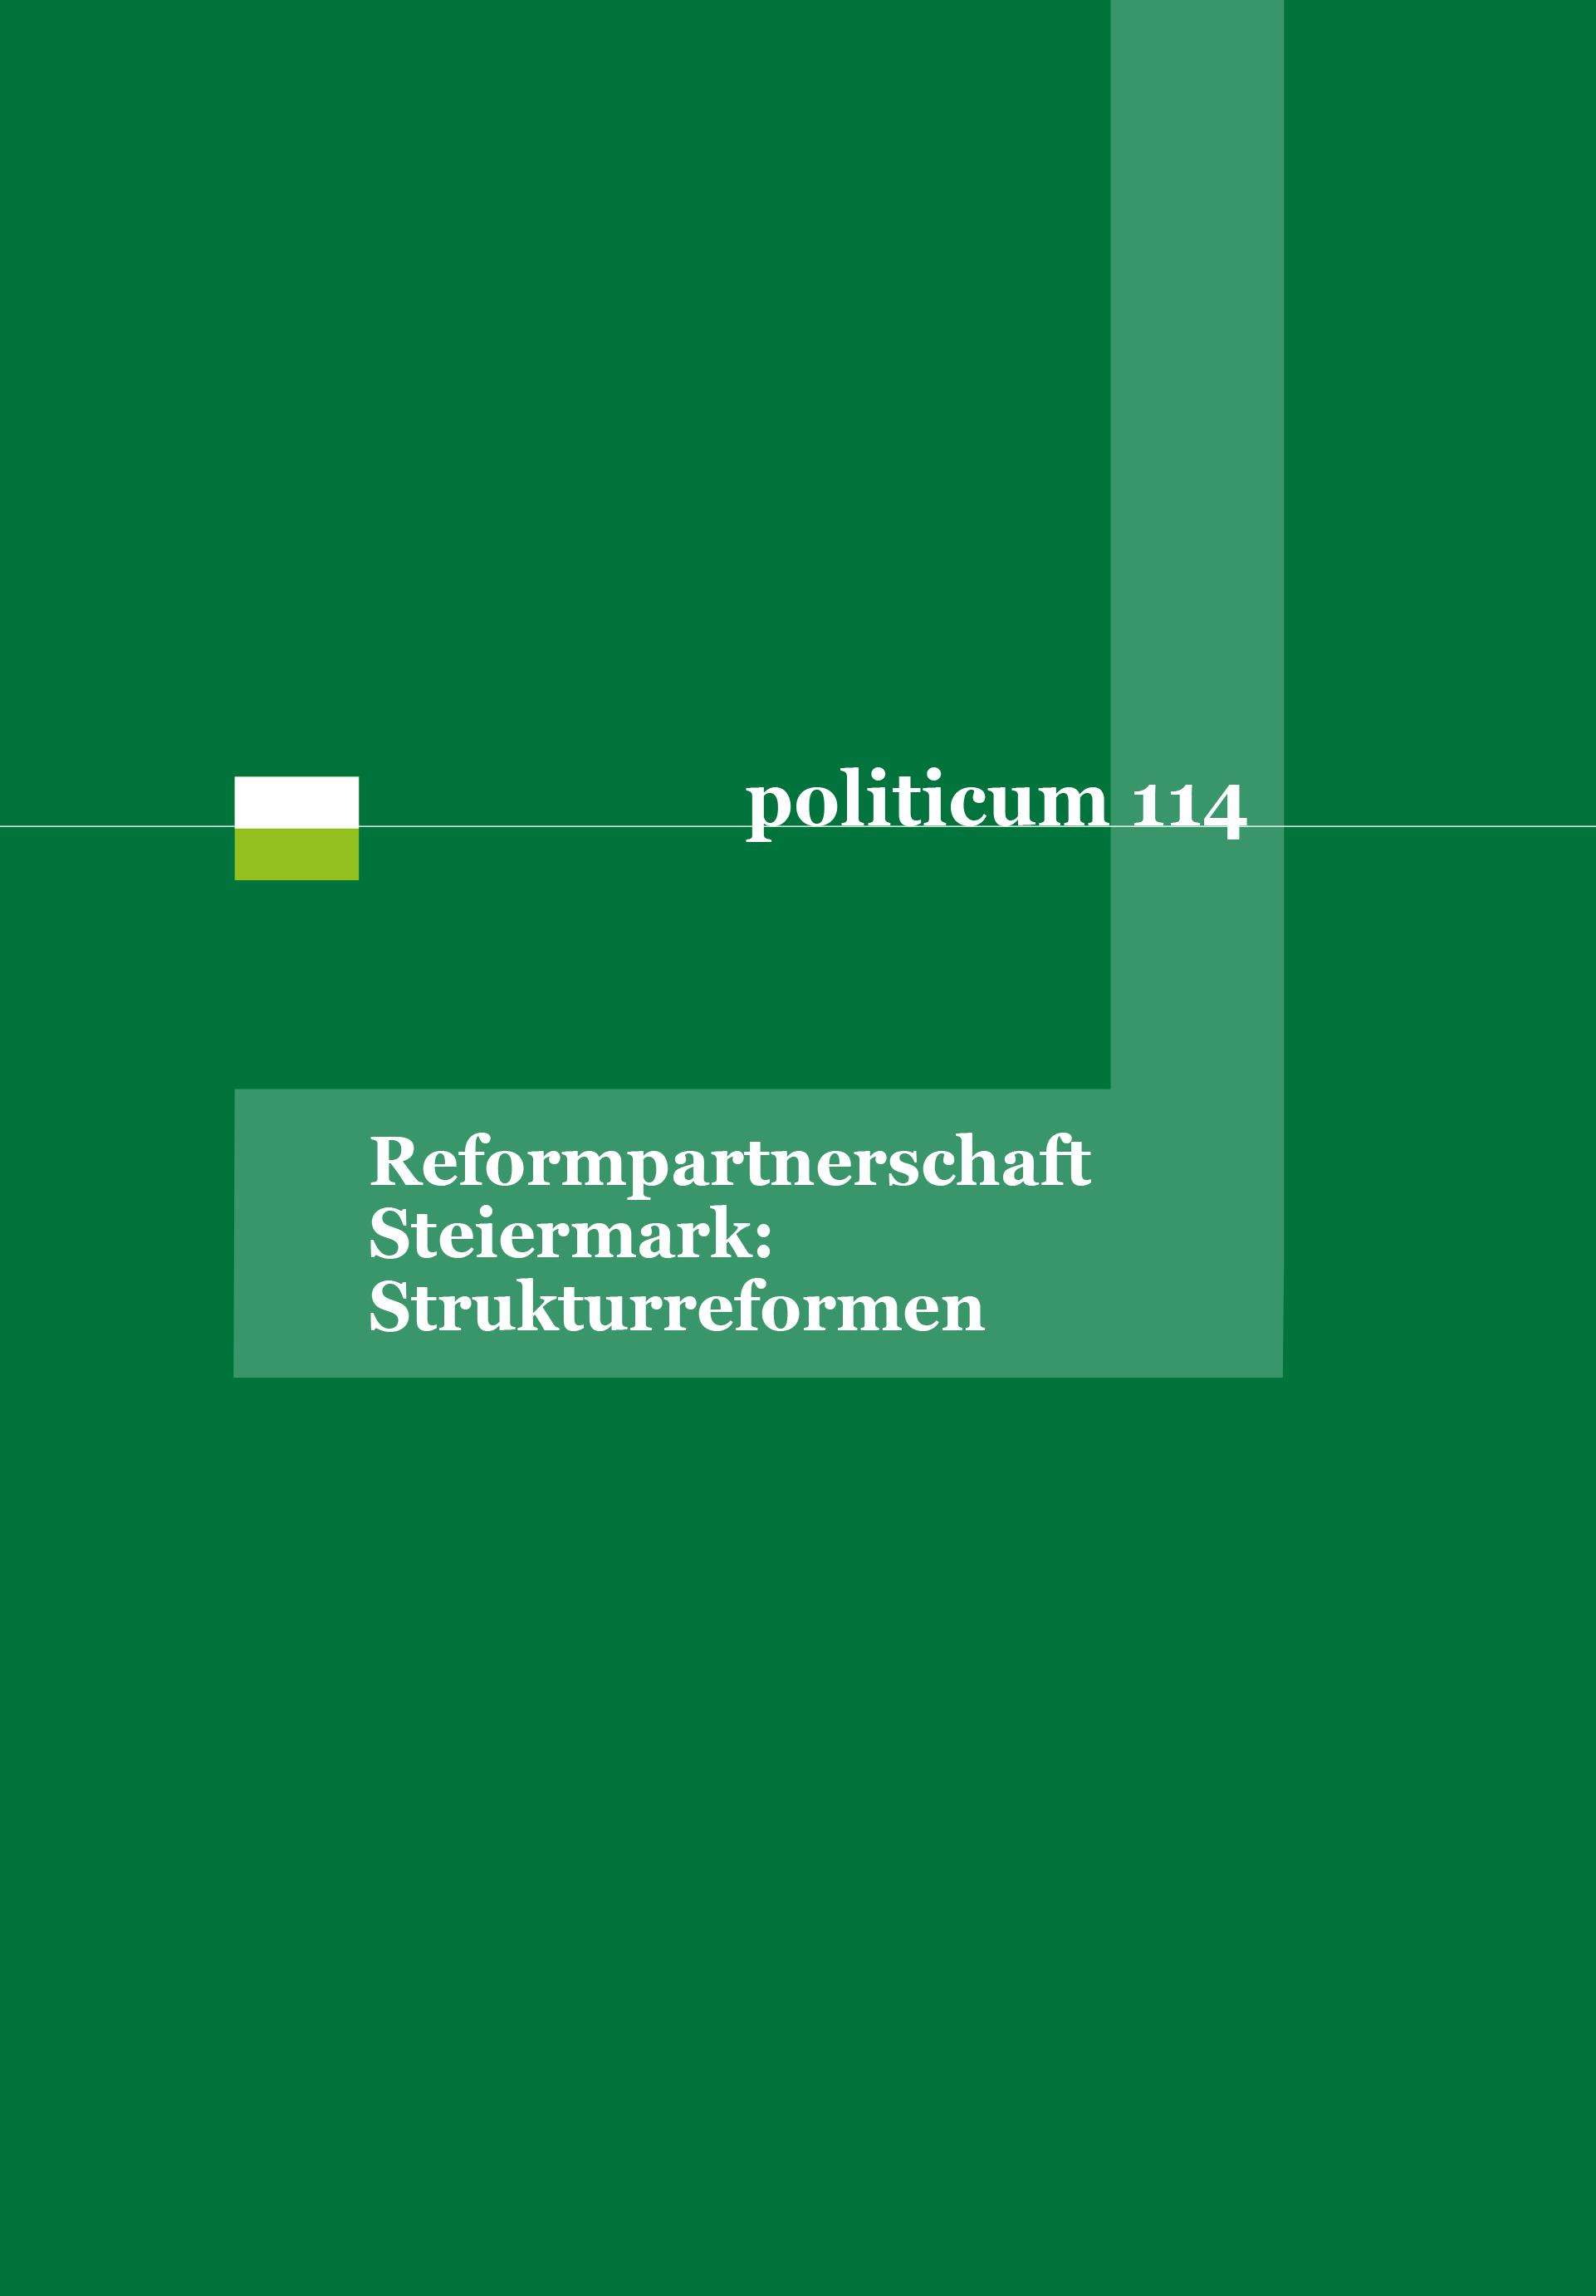 stvp12_politicum-114_cov.indd